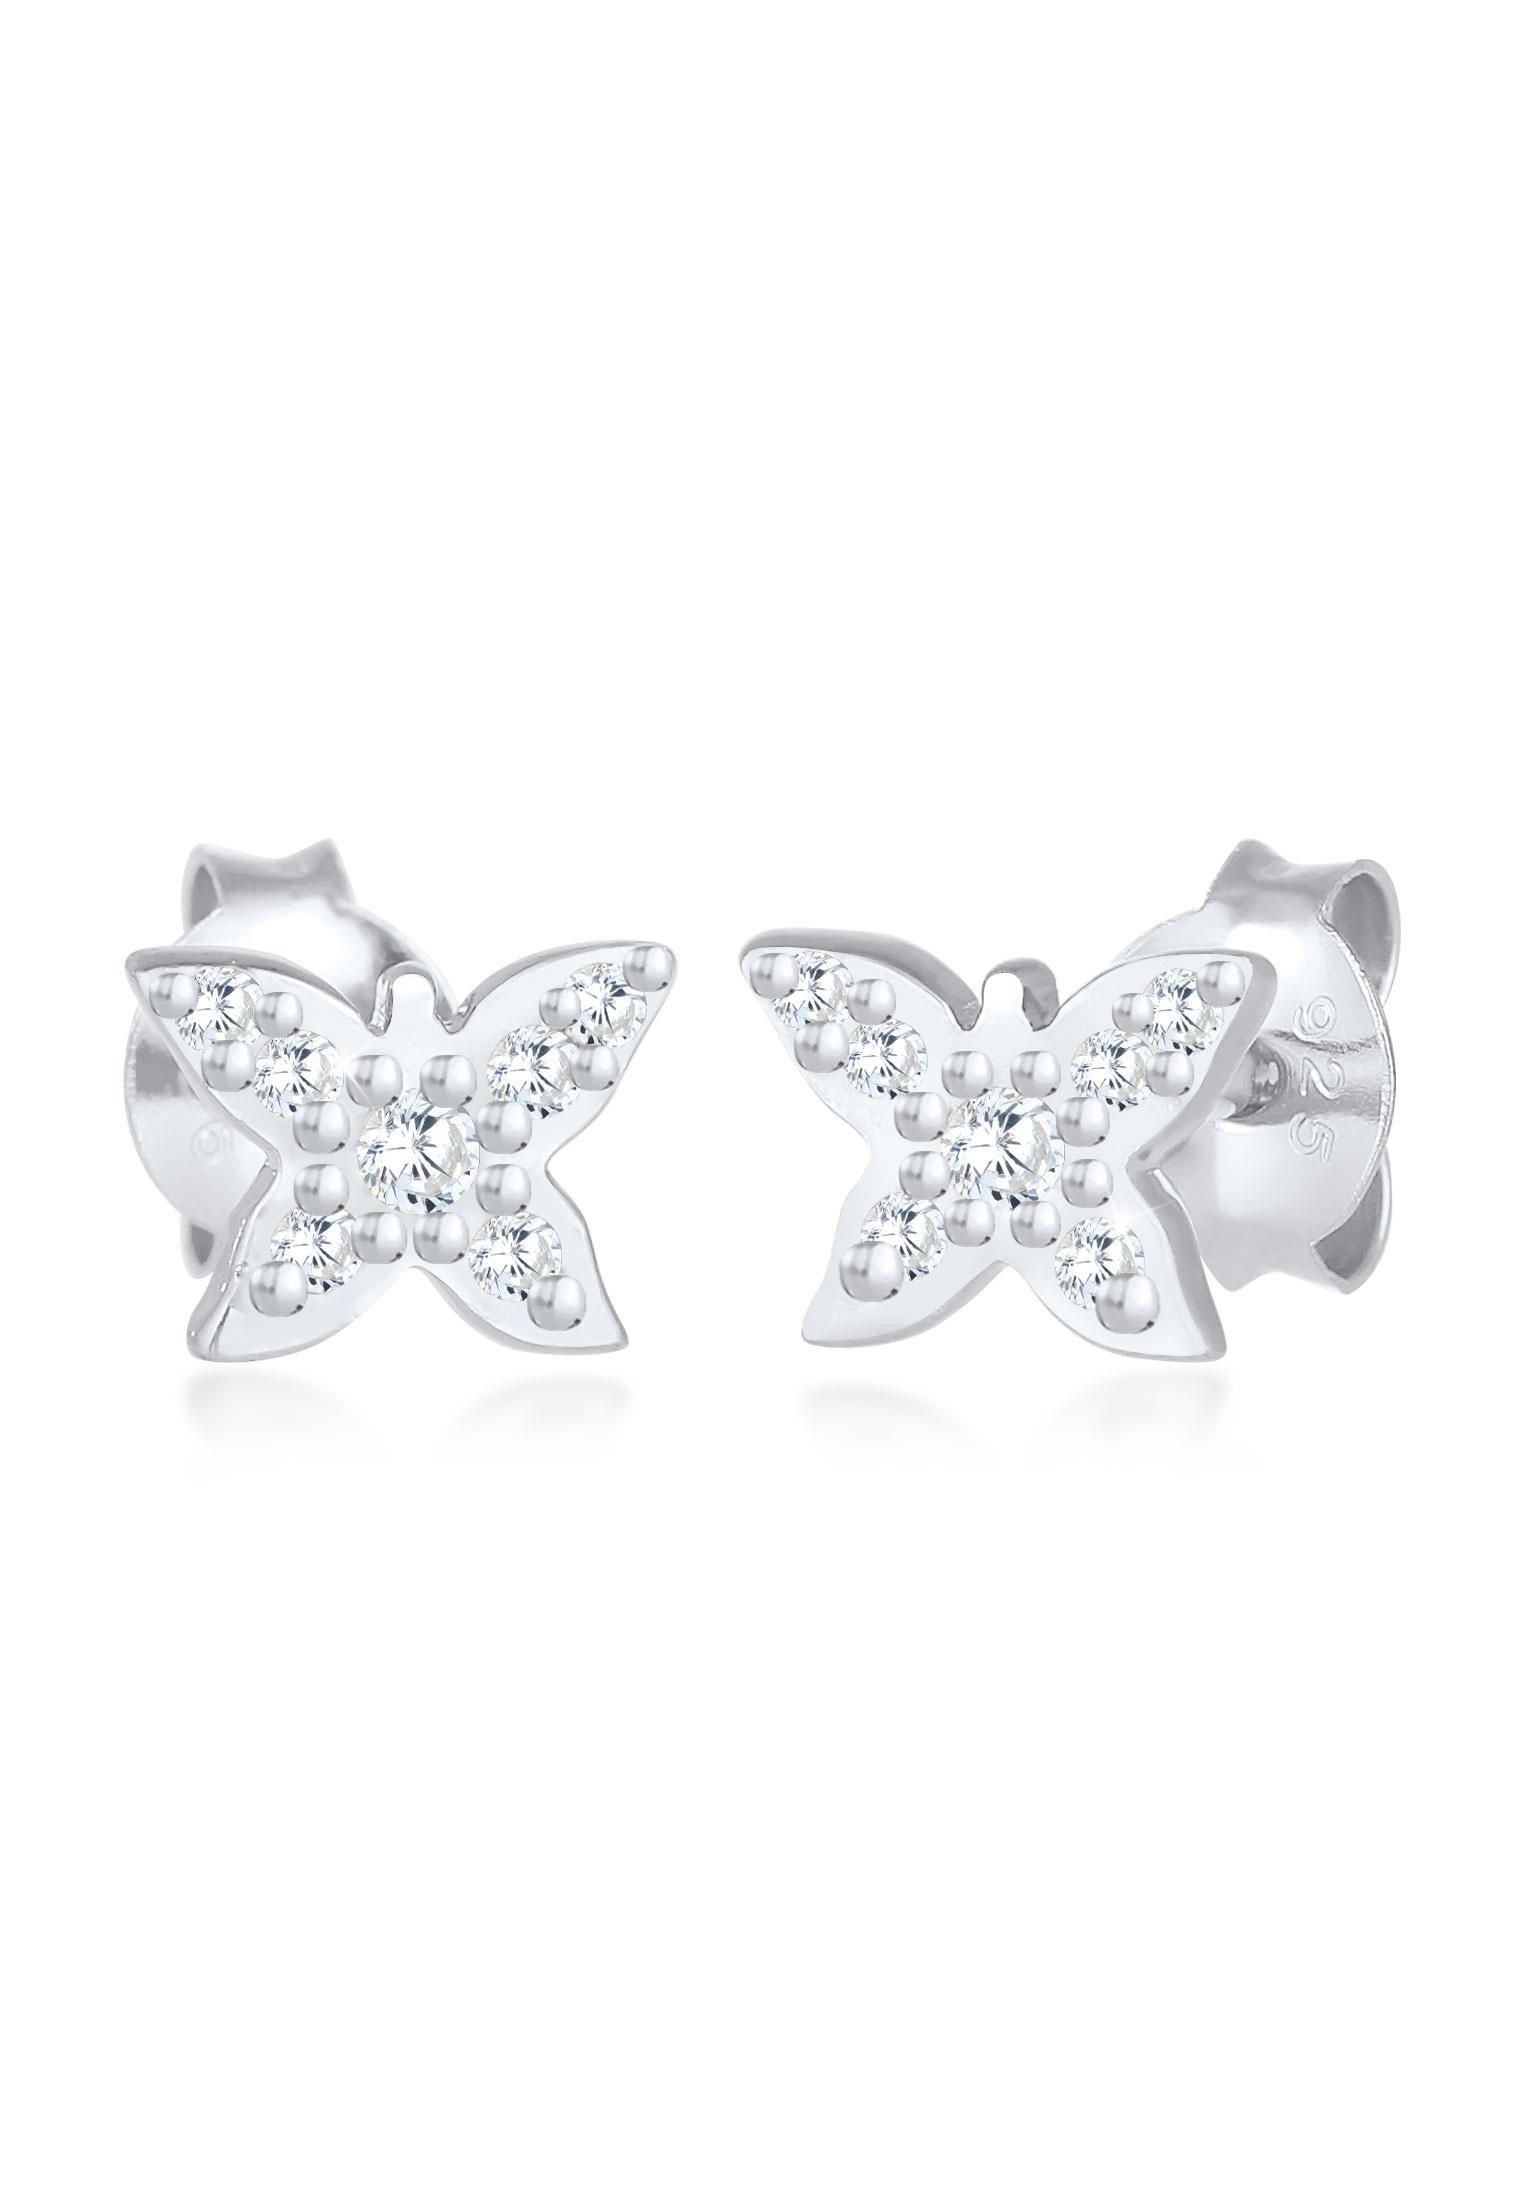 Ohrring Blume | Zirkonia ( Weiß ) | 925er Sterling Silber